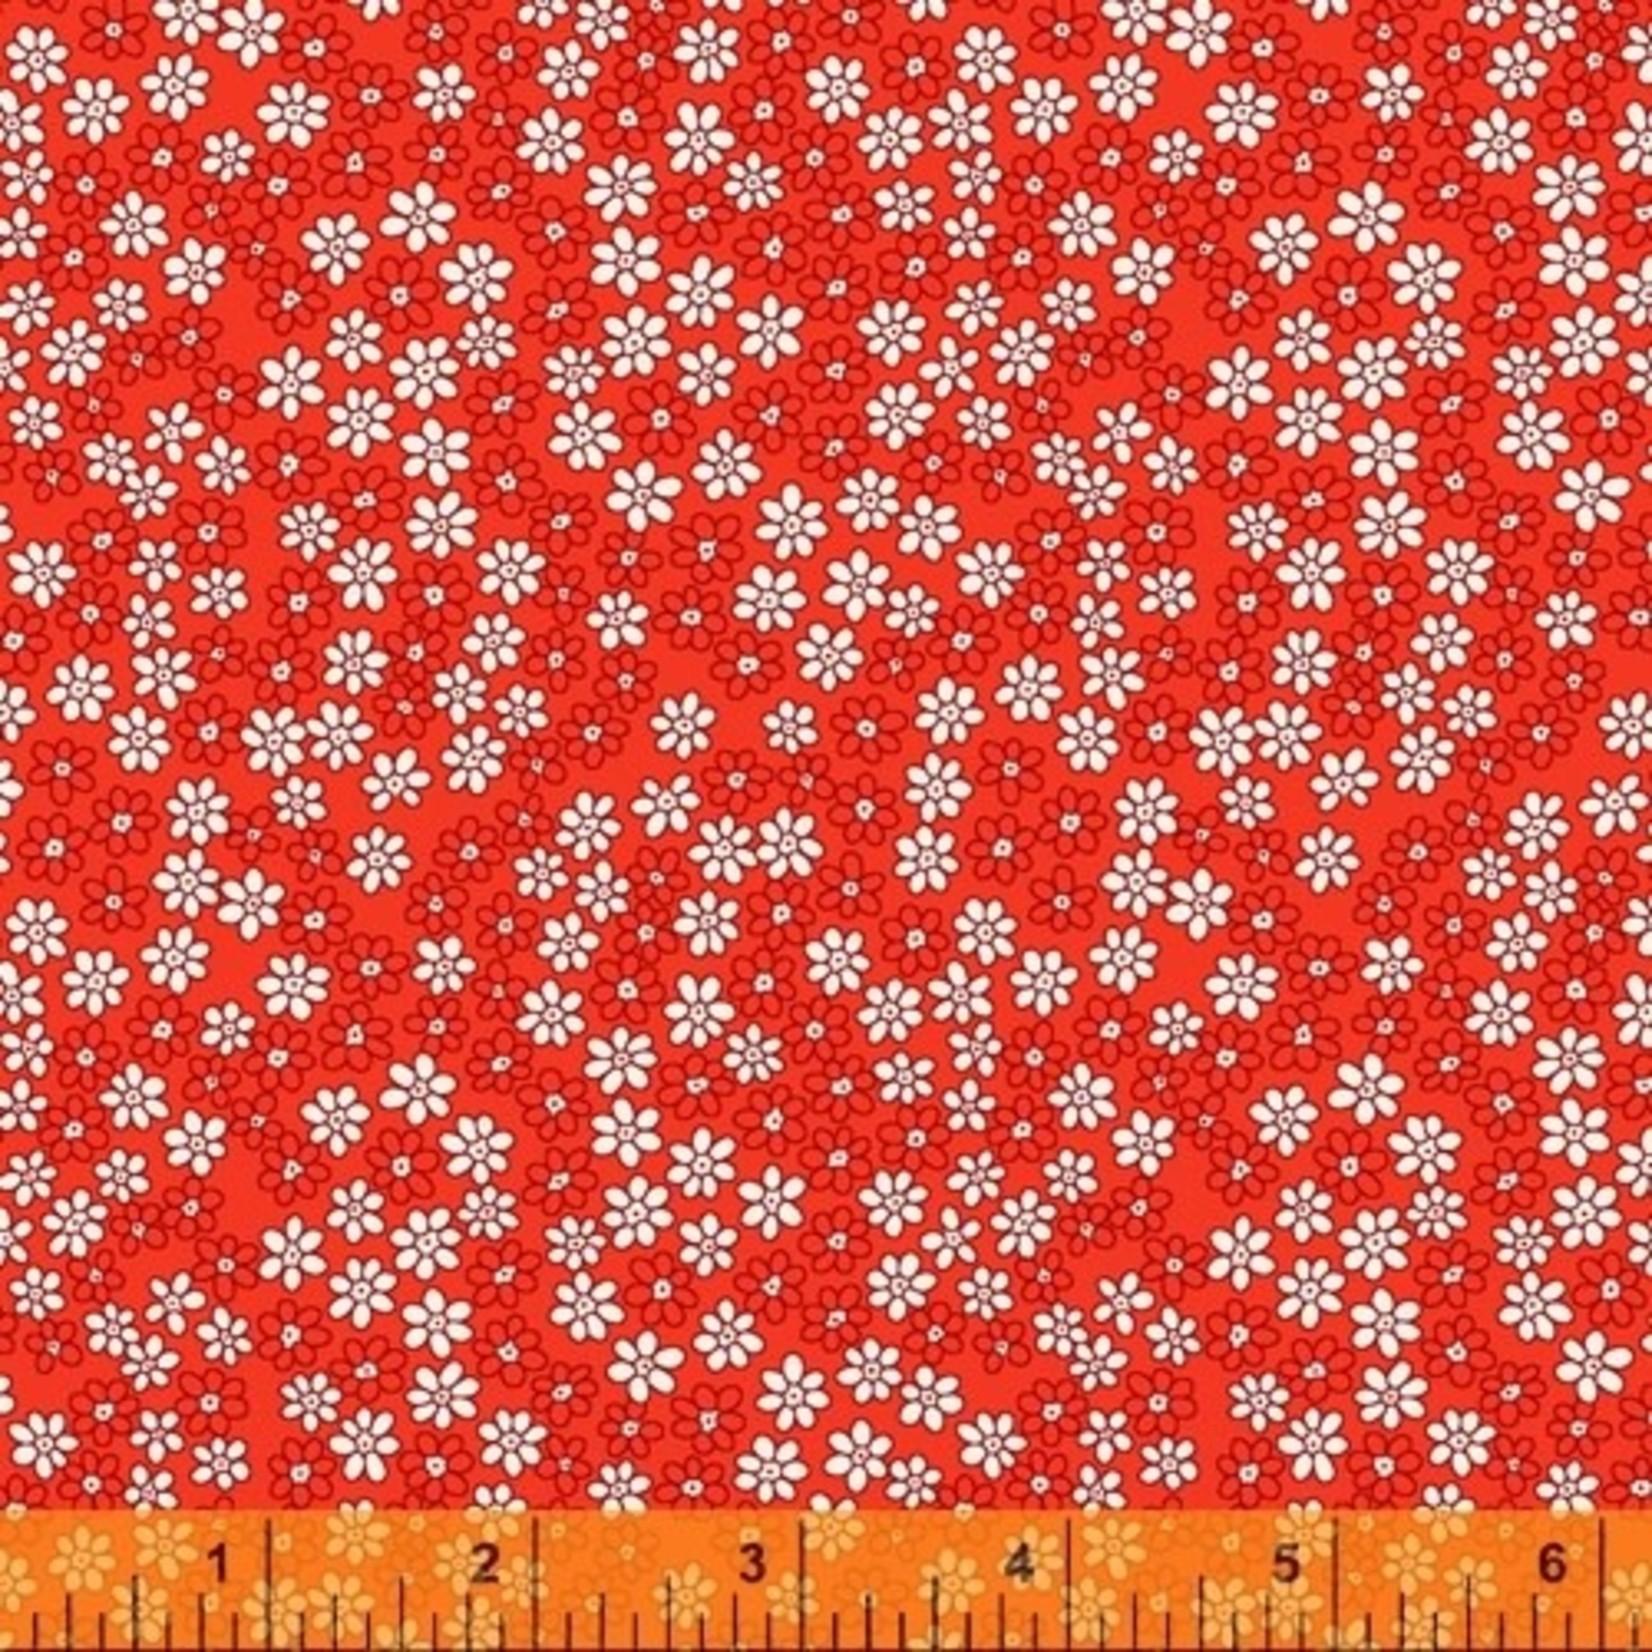 Windham Fabrics STORYBOOK, DAISIES, RED (51983-1) PER CM OR $20/M